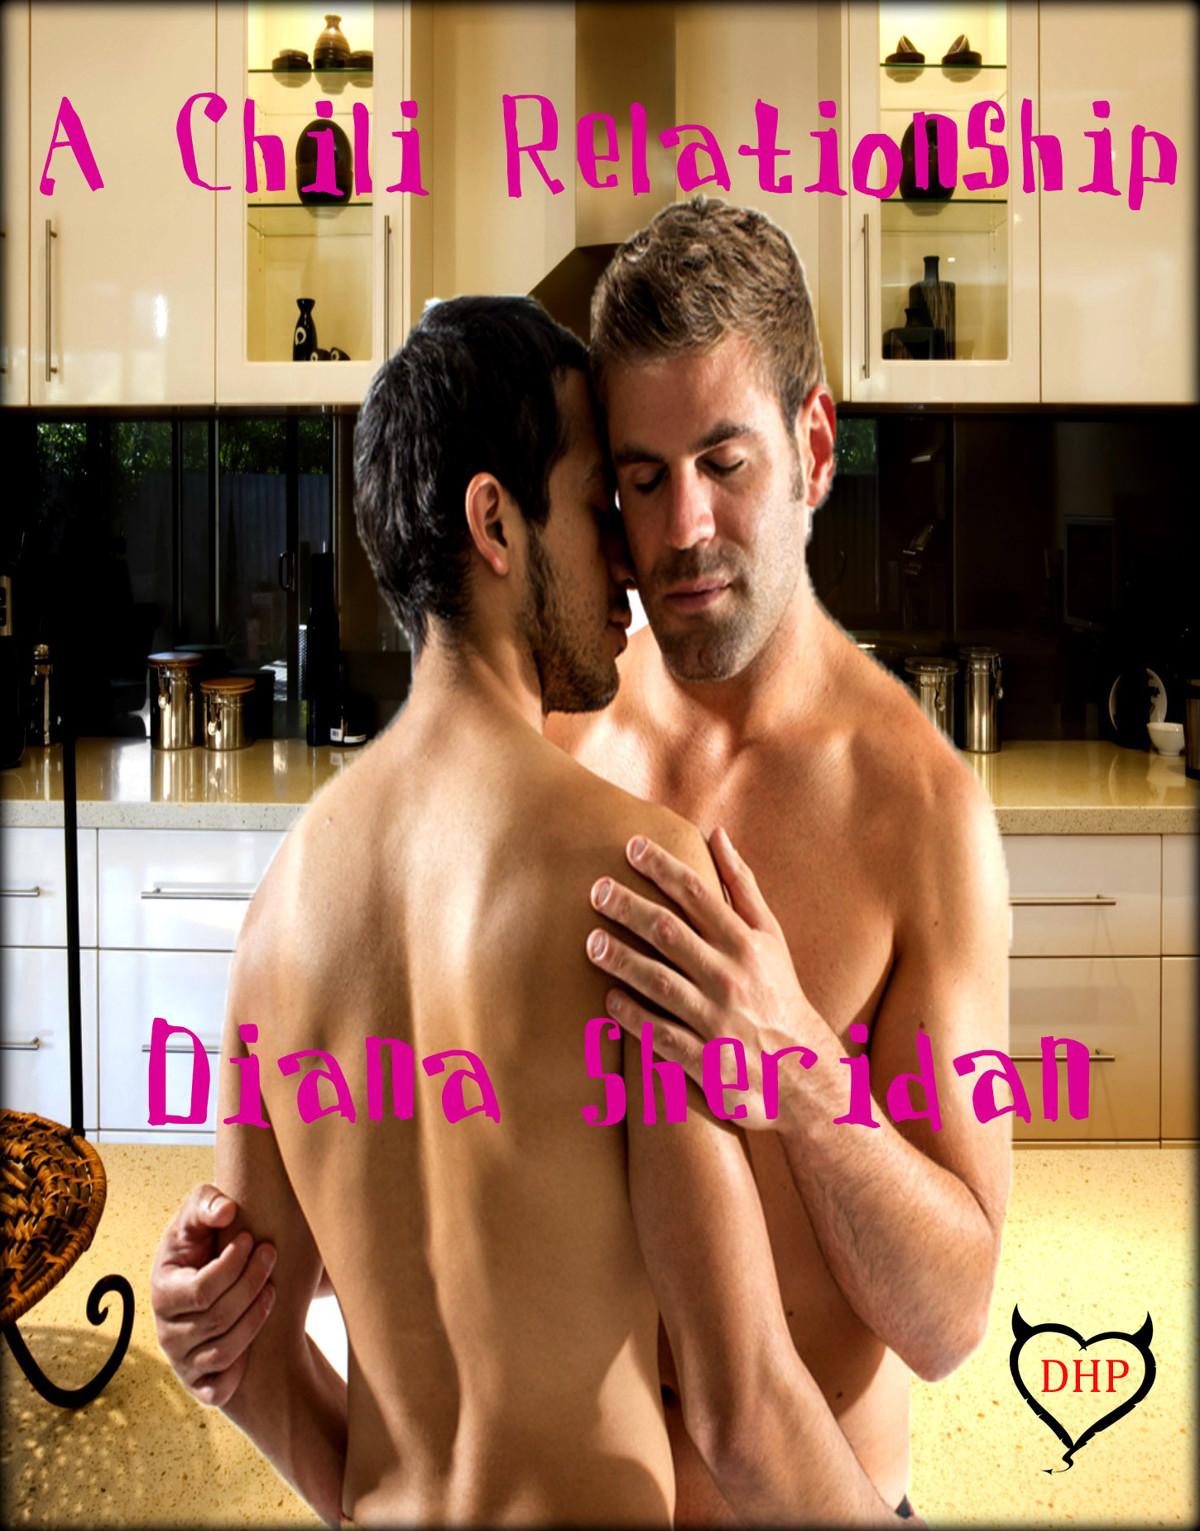 CHILI RELATIONSHIP, A - Diana Sheridan